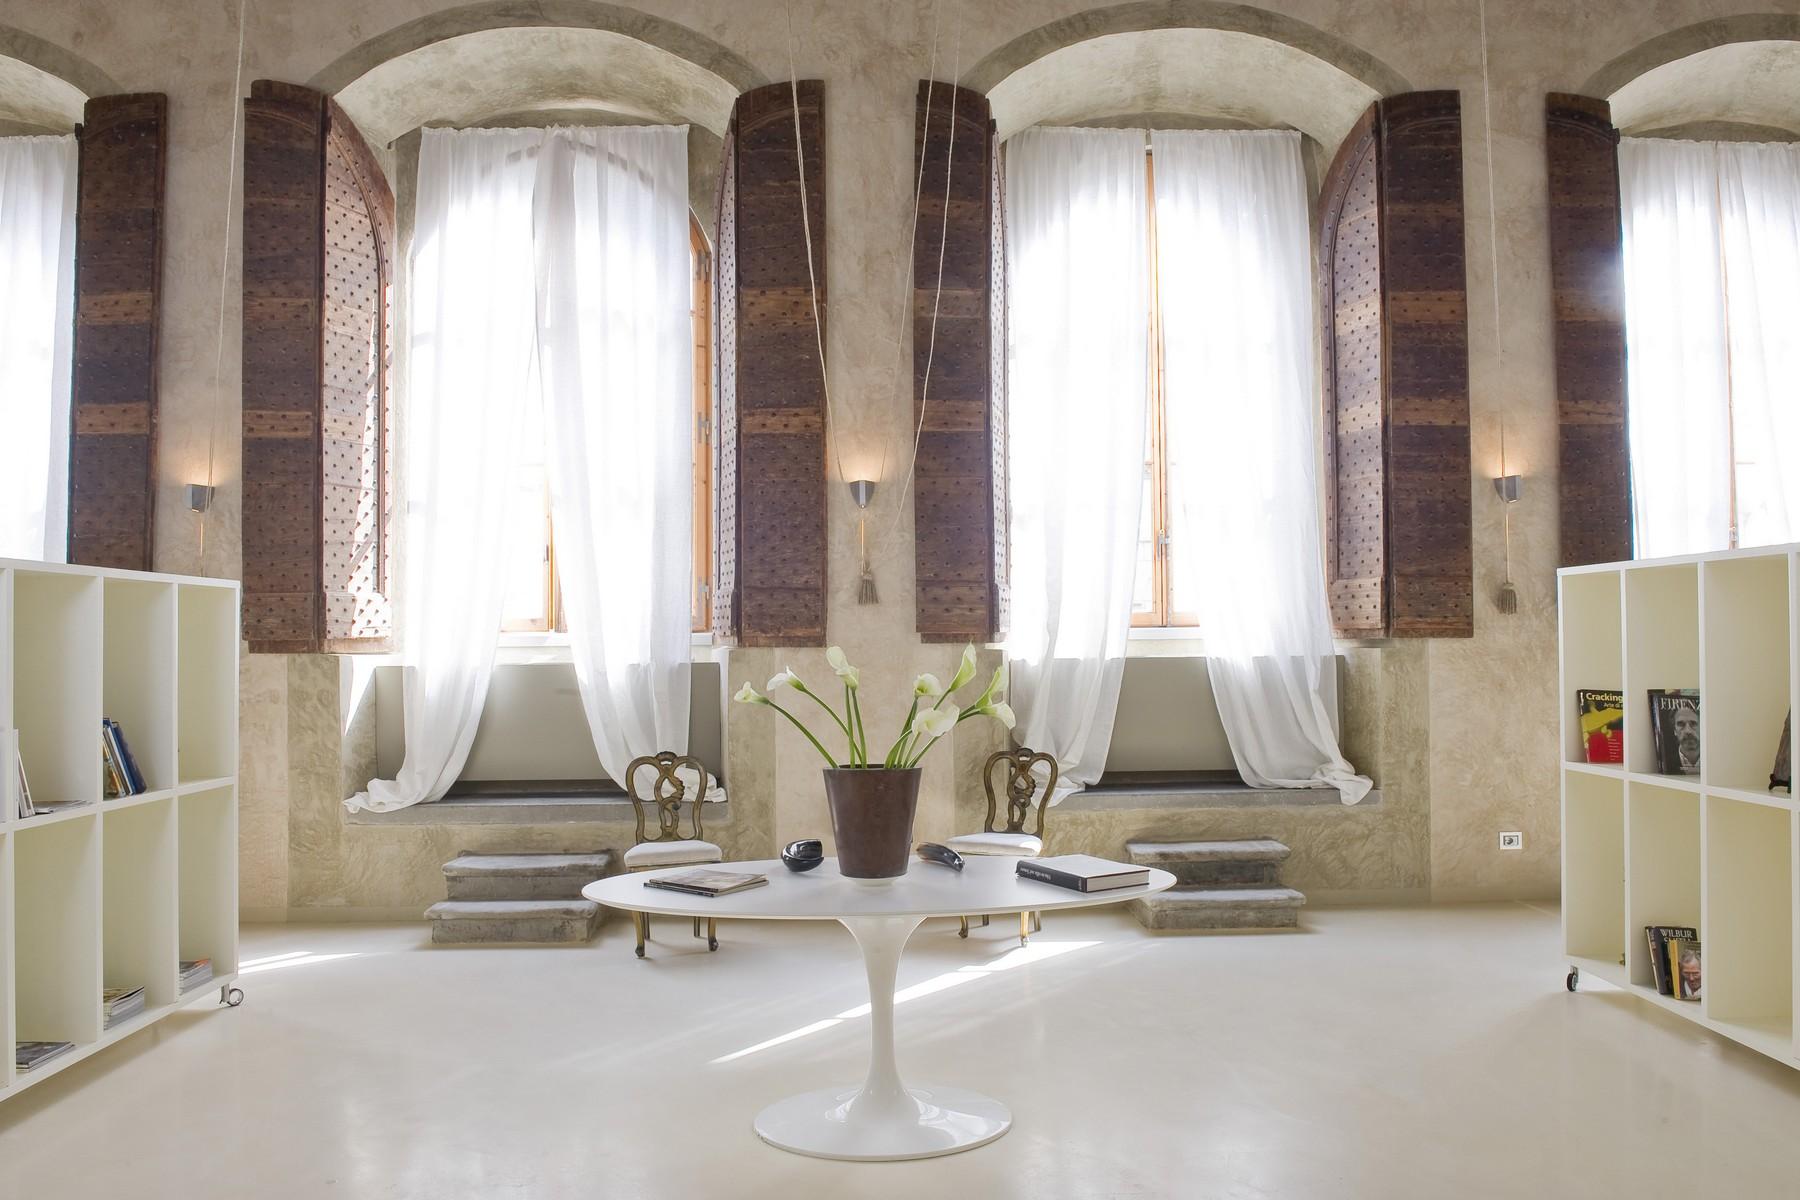 Appartamento in Vendita a Firenze via de' benci